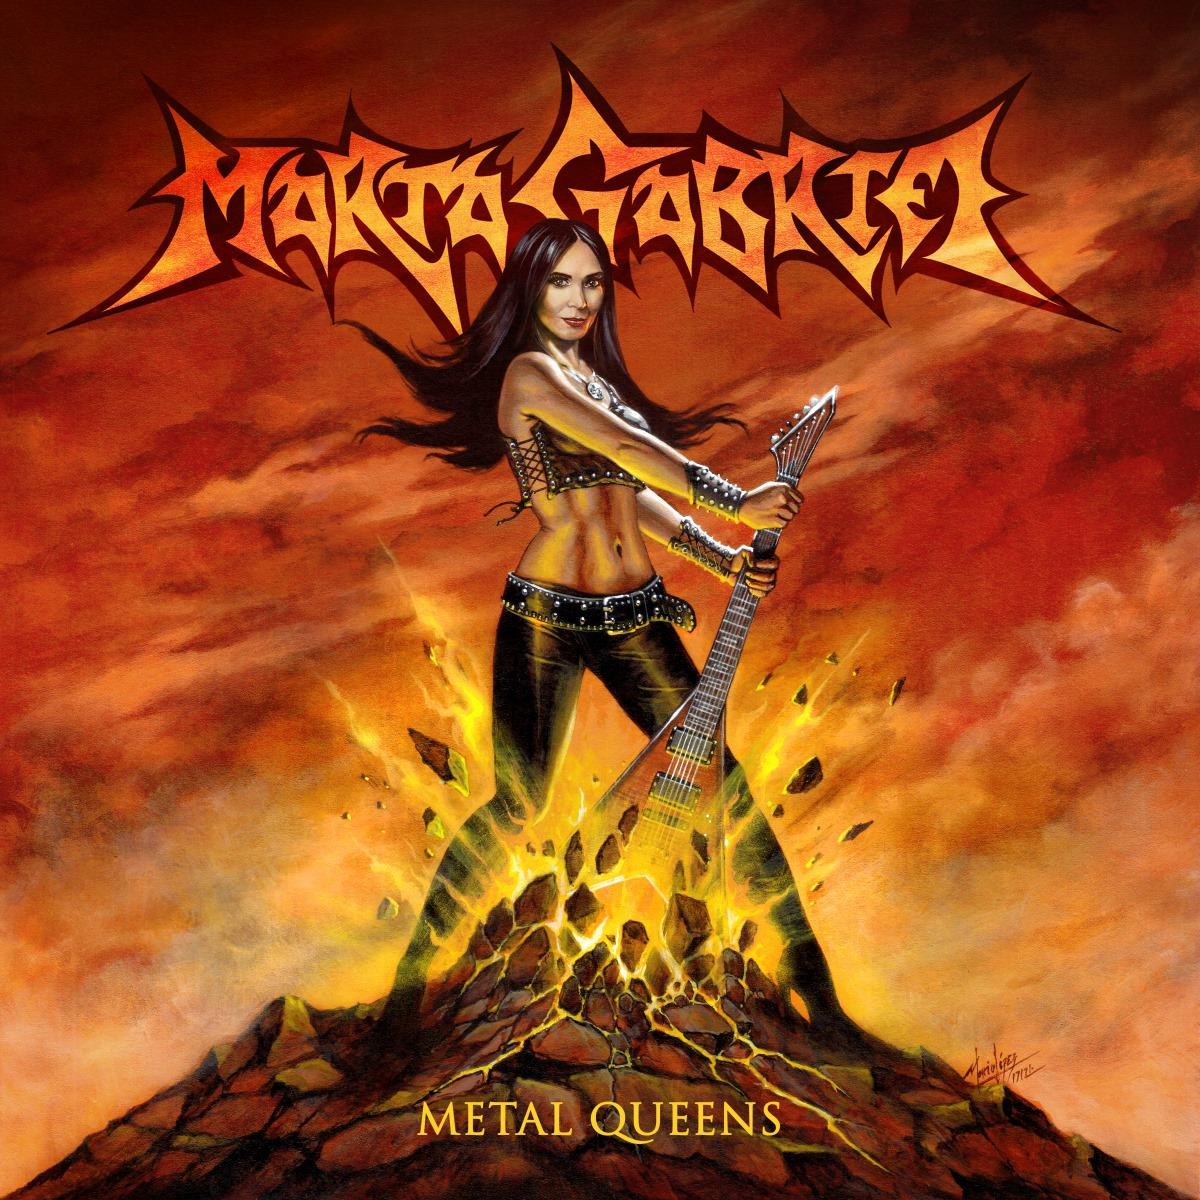 Marta Gabriel Metal Queens Album Cover Artwork